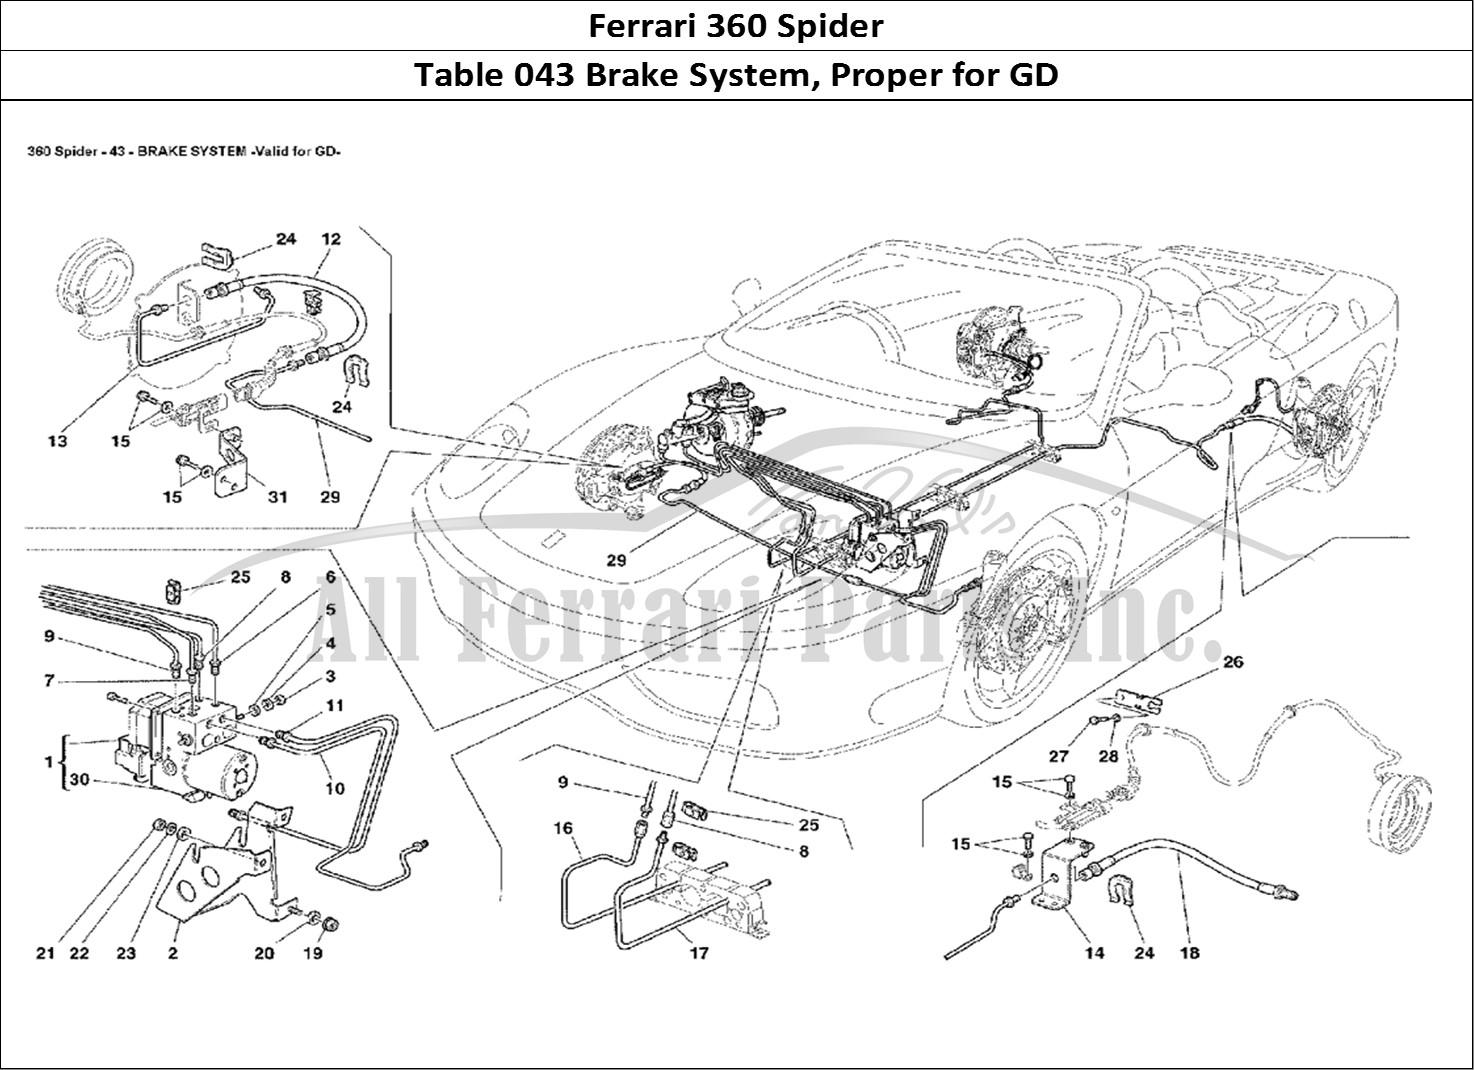 Buy Original Ferrari 360 Spider 043 Brake System Proper